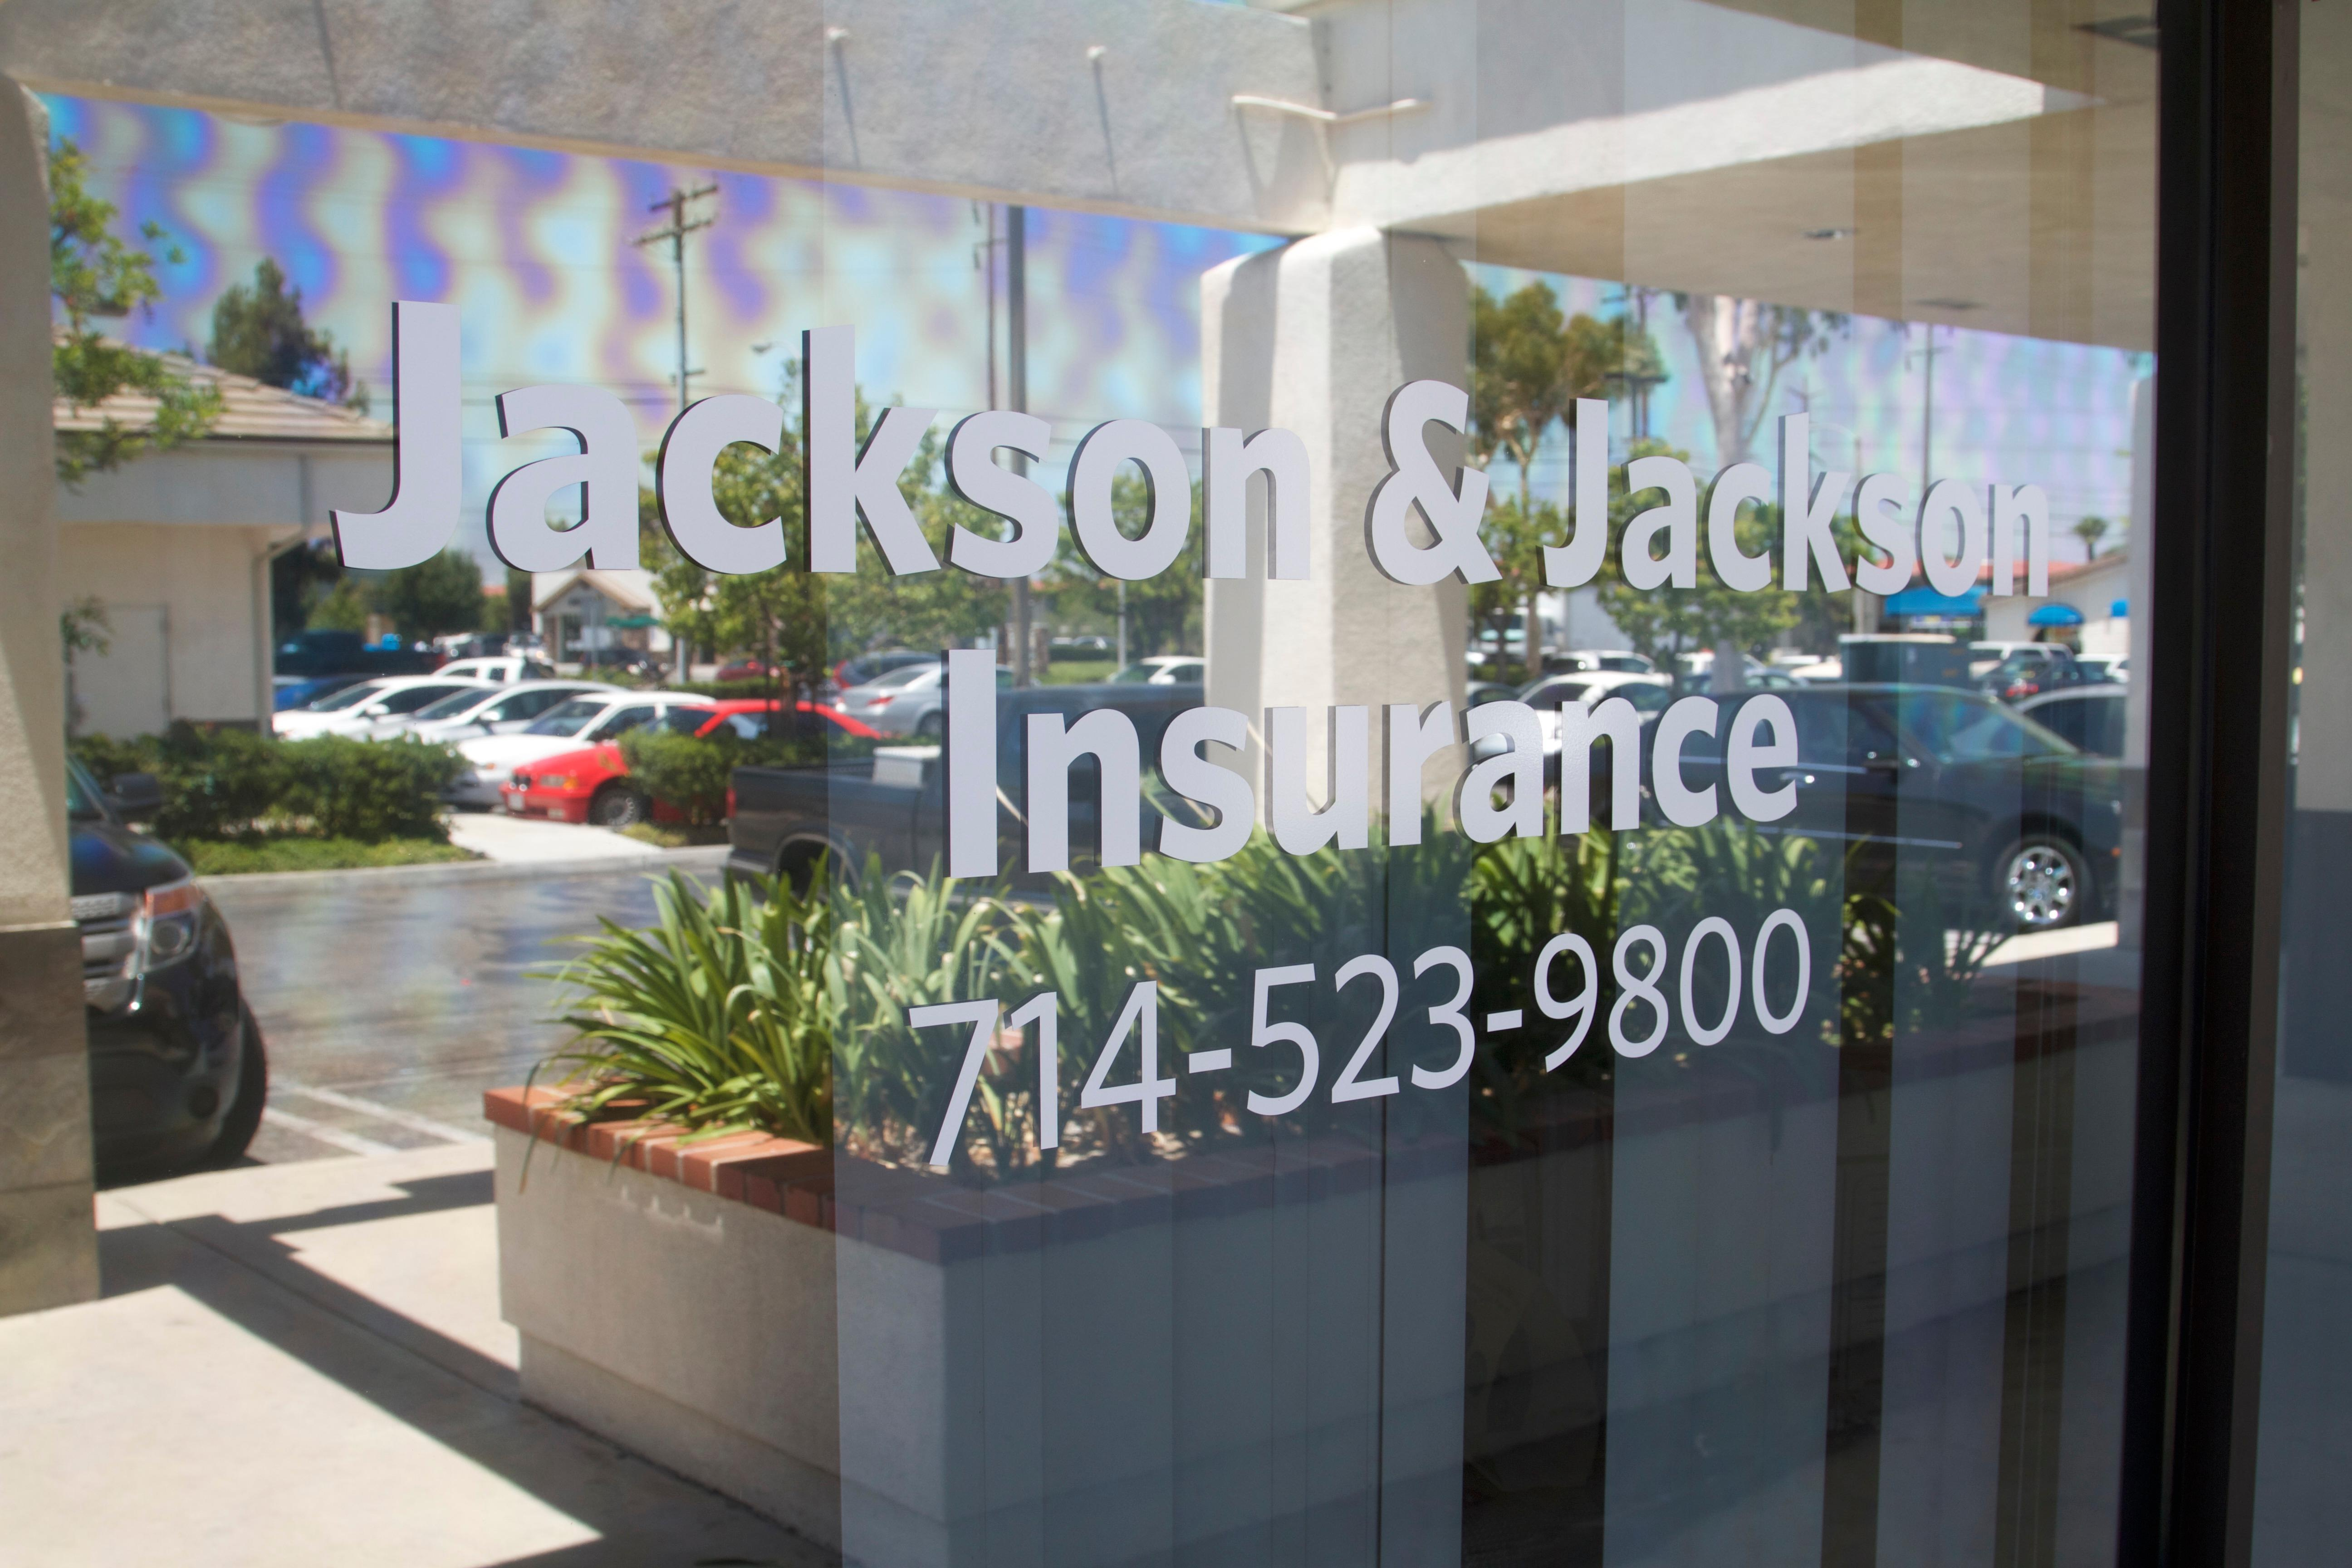 Patricia Jackson: Allstate Insurance image 5